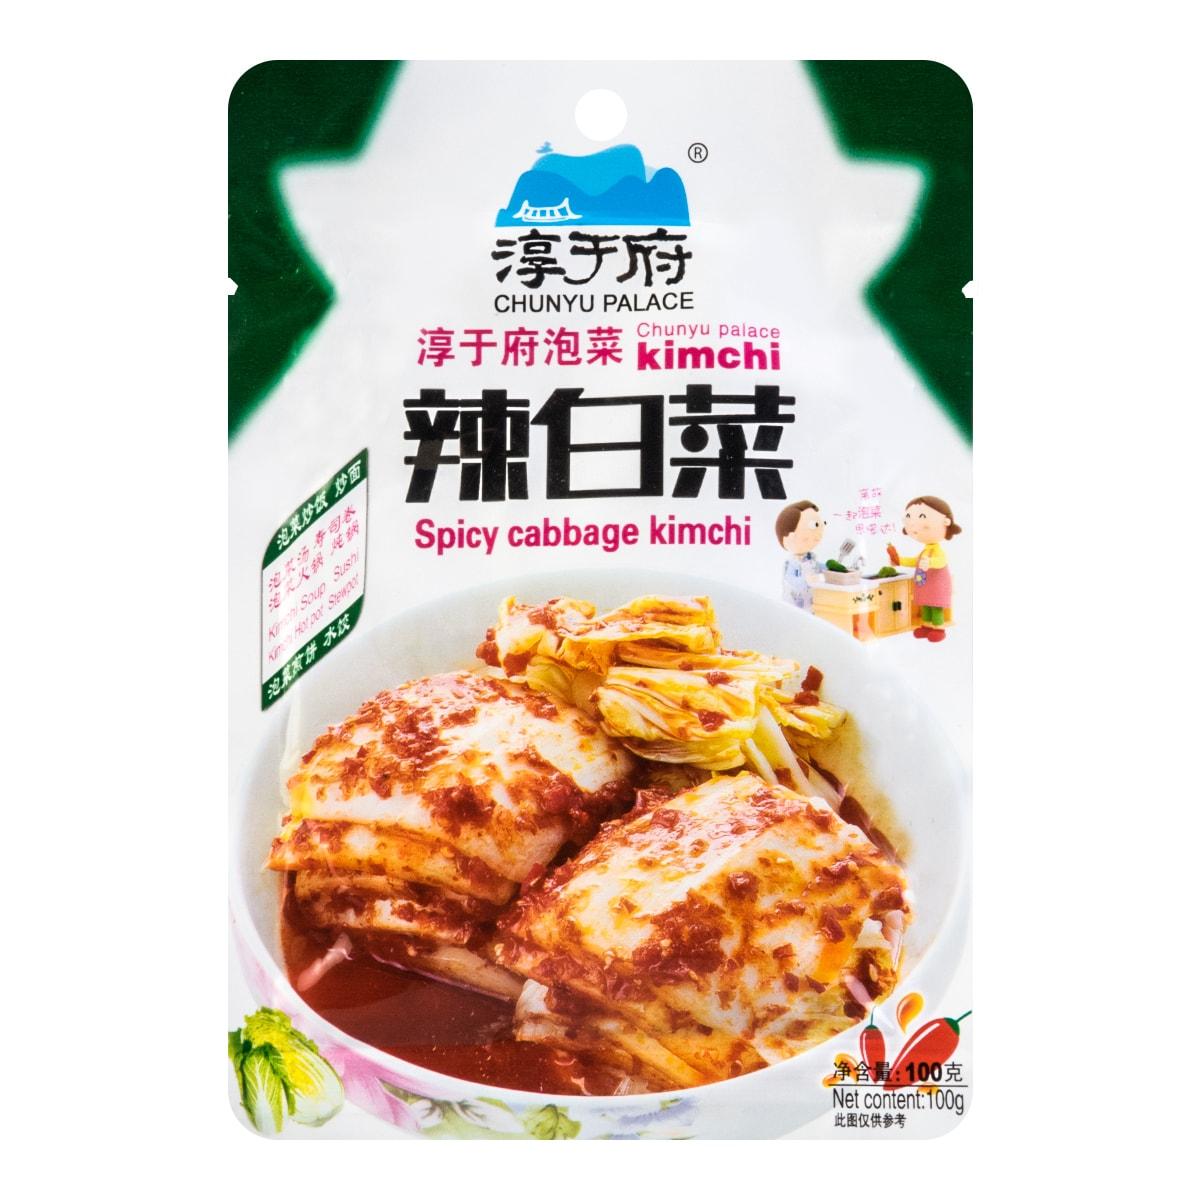 CHUNYU PALACE Korea Kimchi Spicy Cabbage Kimchi 100g